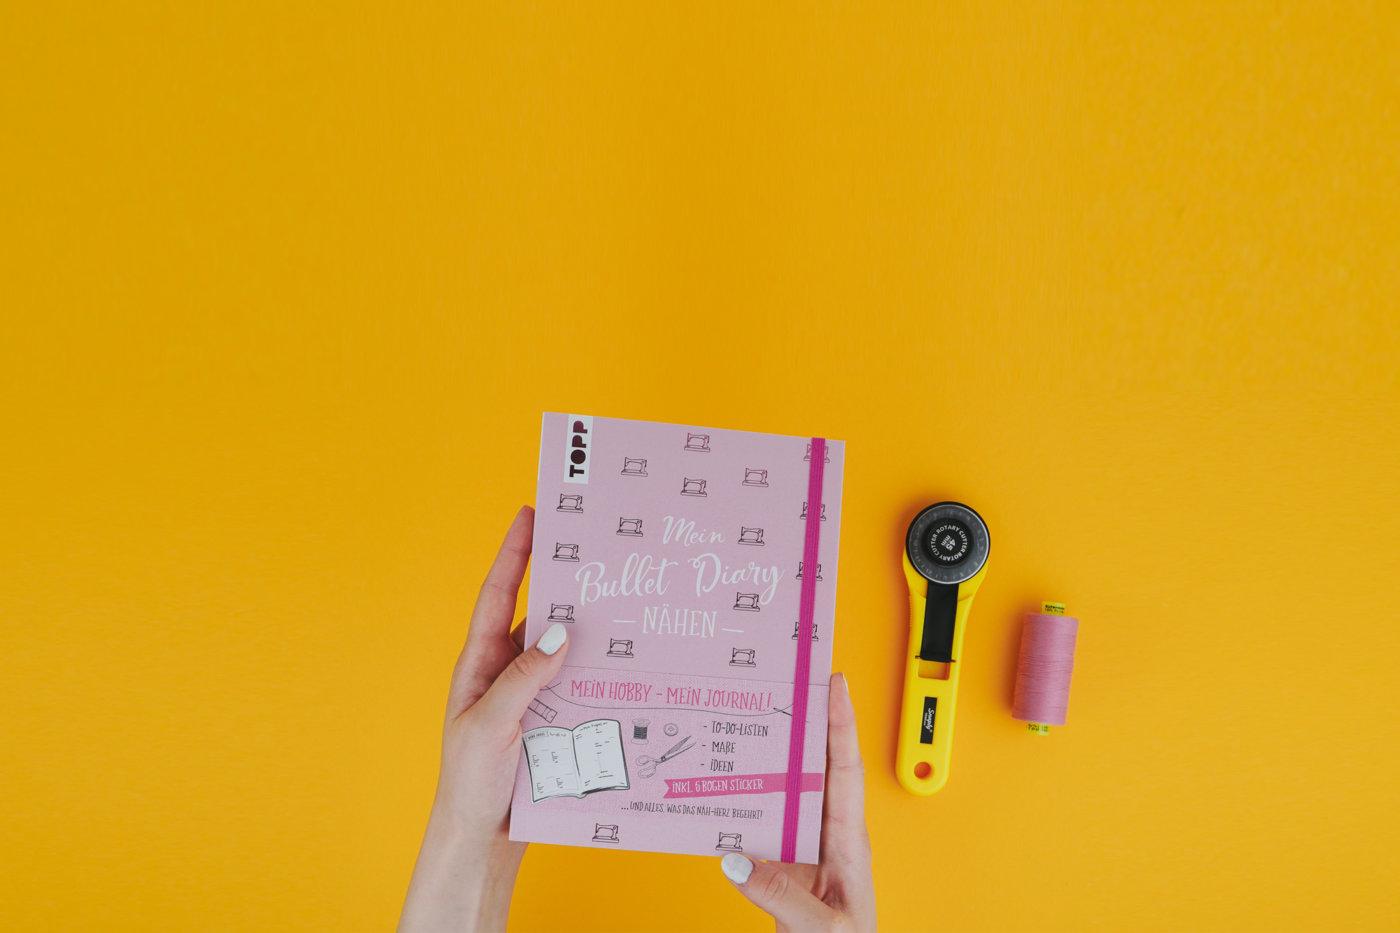 Nähplaner Buch im TOPP / Frechverlag: »Mein Bullet Diary« Nähen von Fredi alias Seemannsgarn nähplaner Nähplaner: Mein Bullet Diary 📒✂️ naehplaner bullet diary